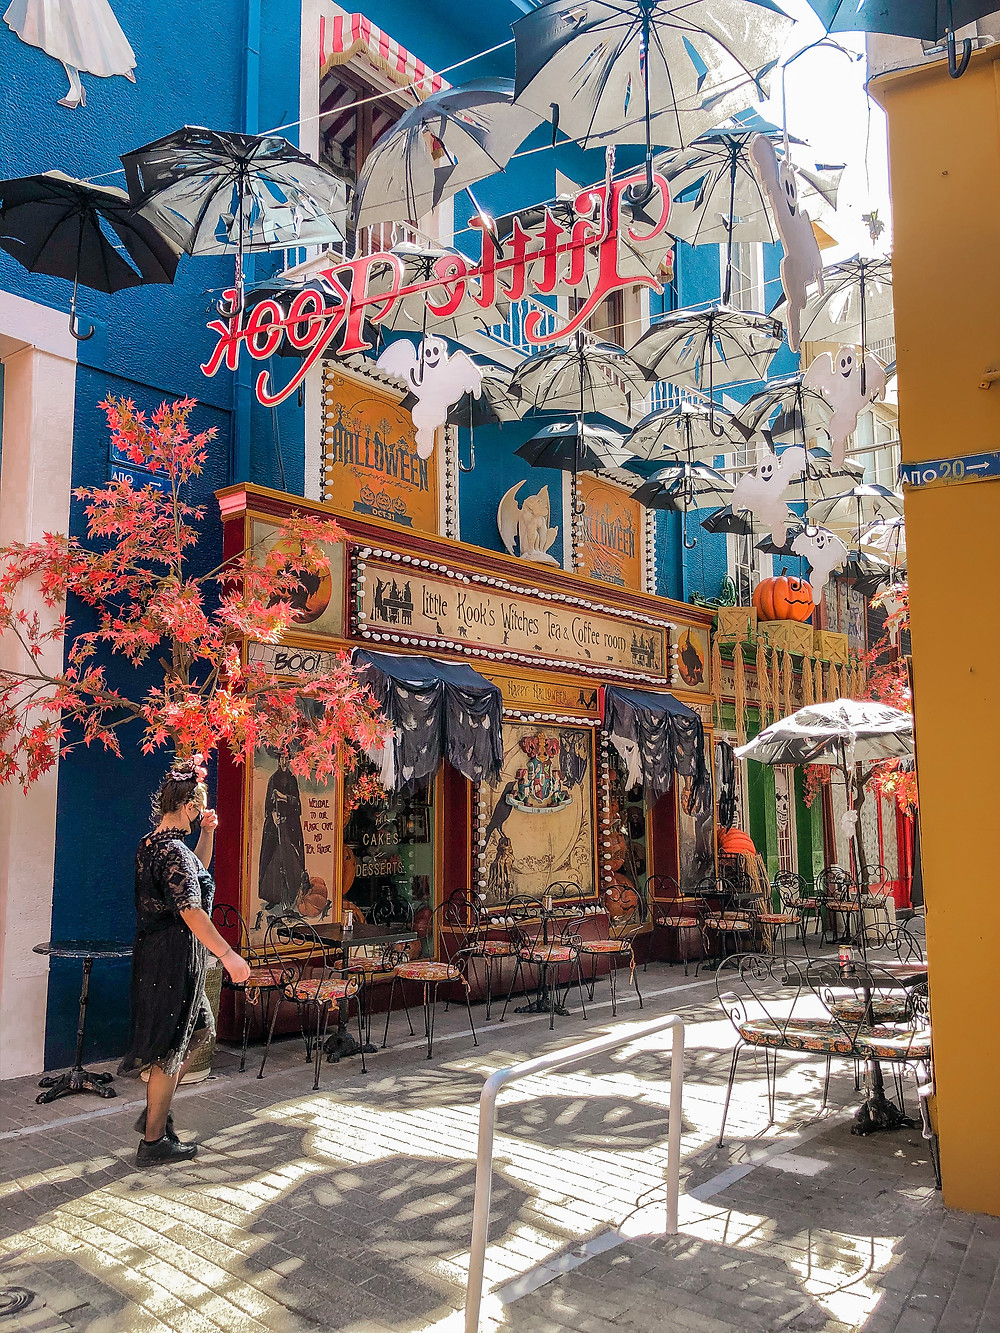 Athen-regenschirm-gasse-Cafe-little-KooK